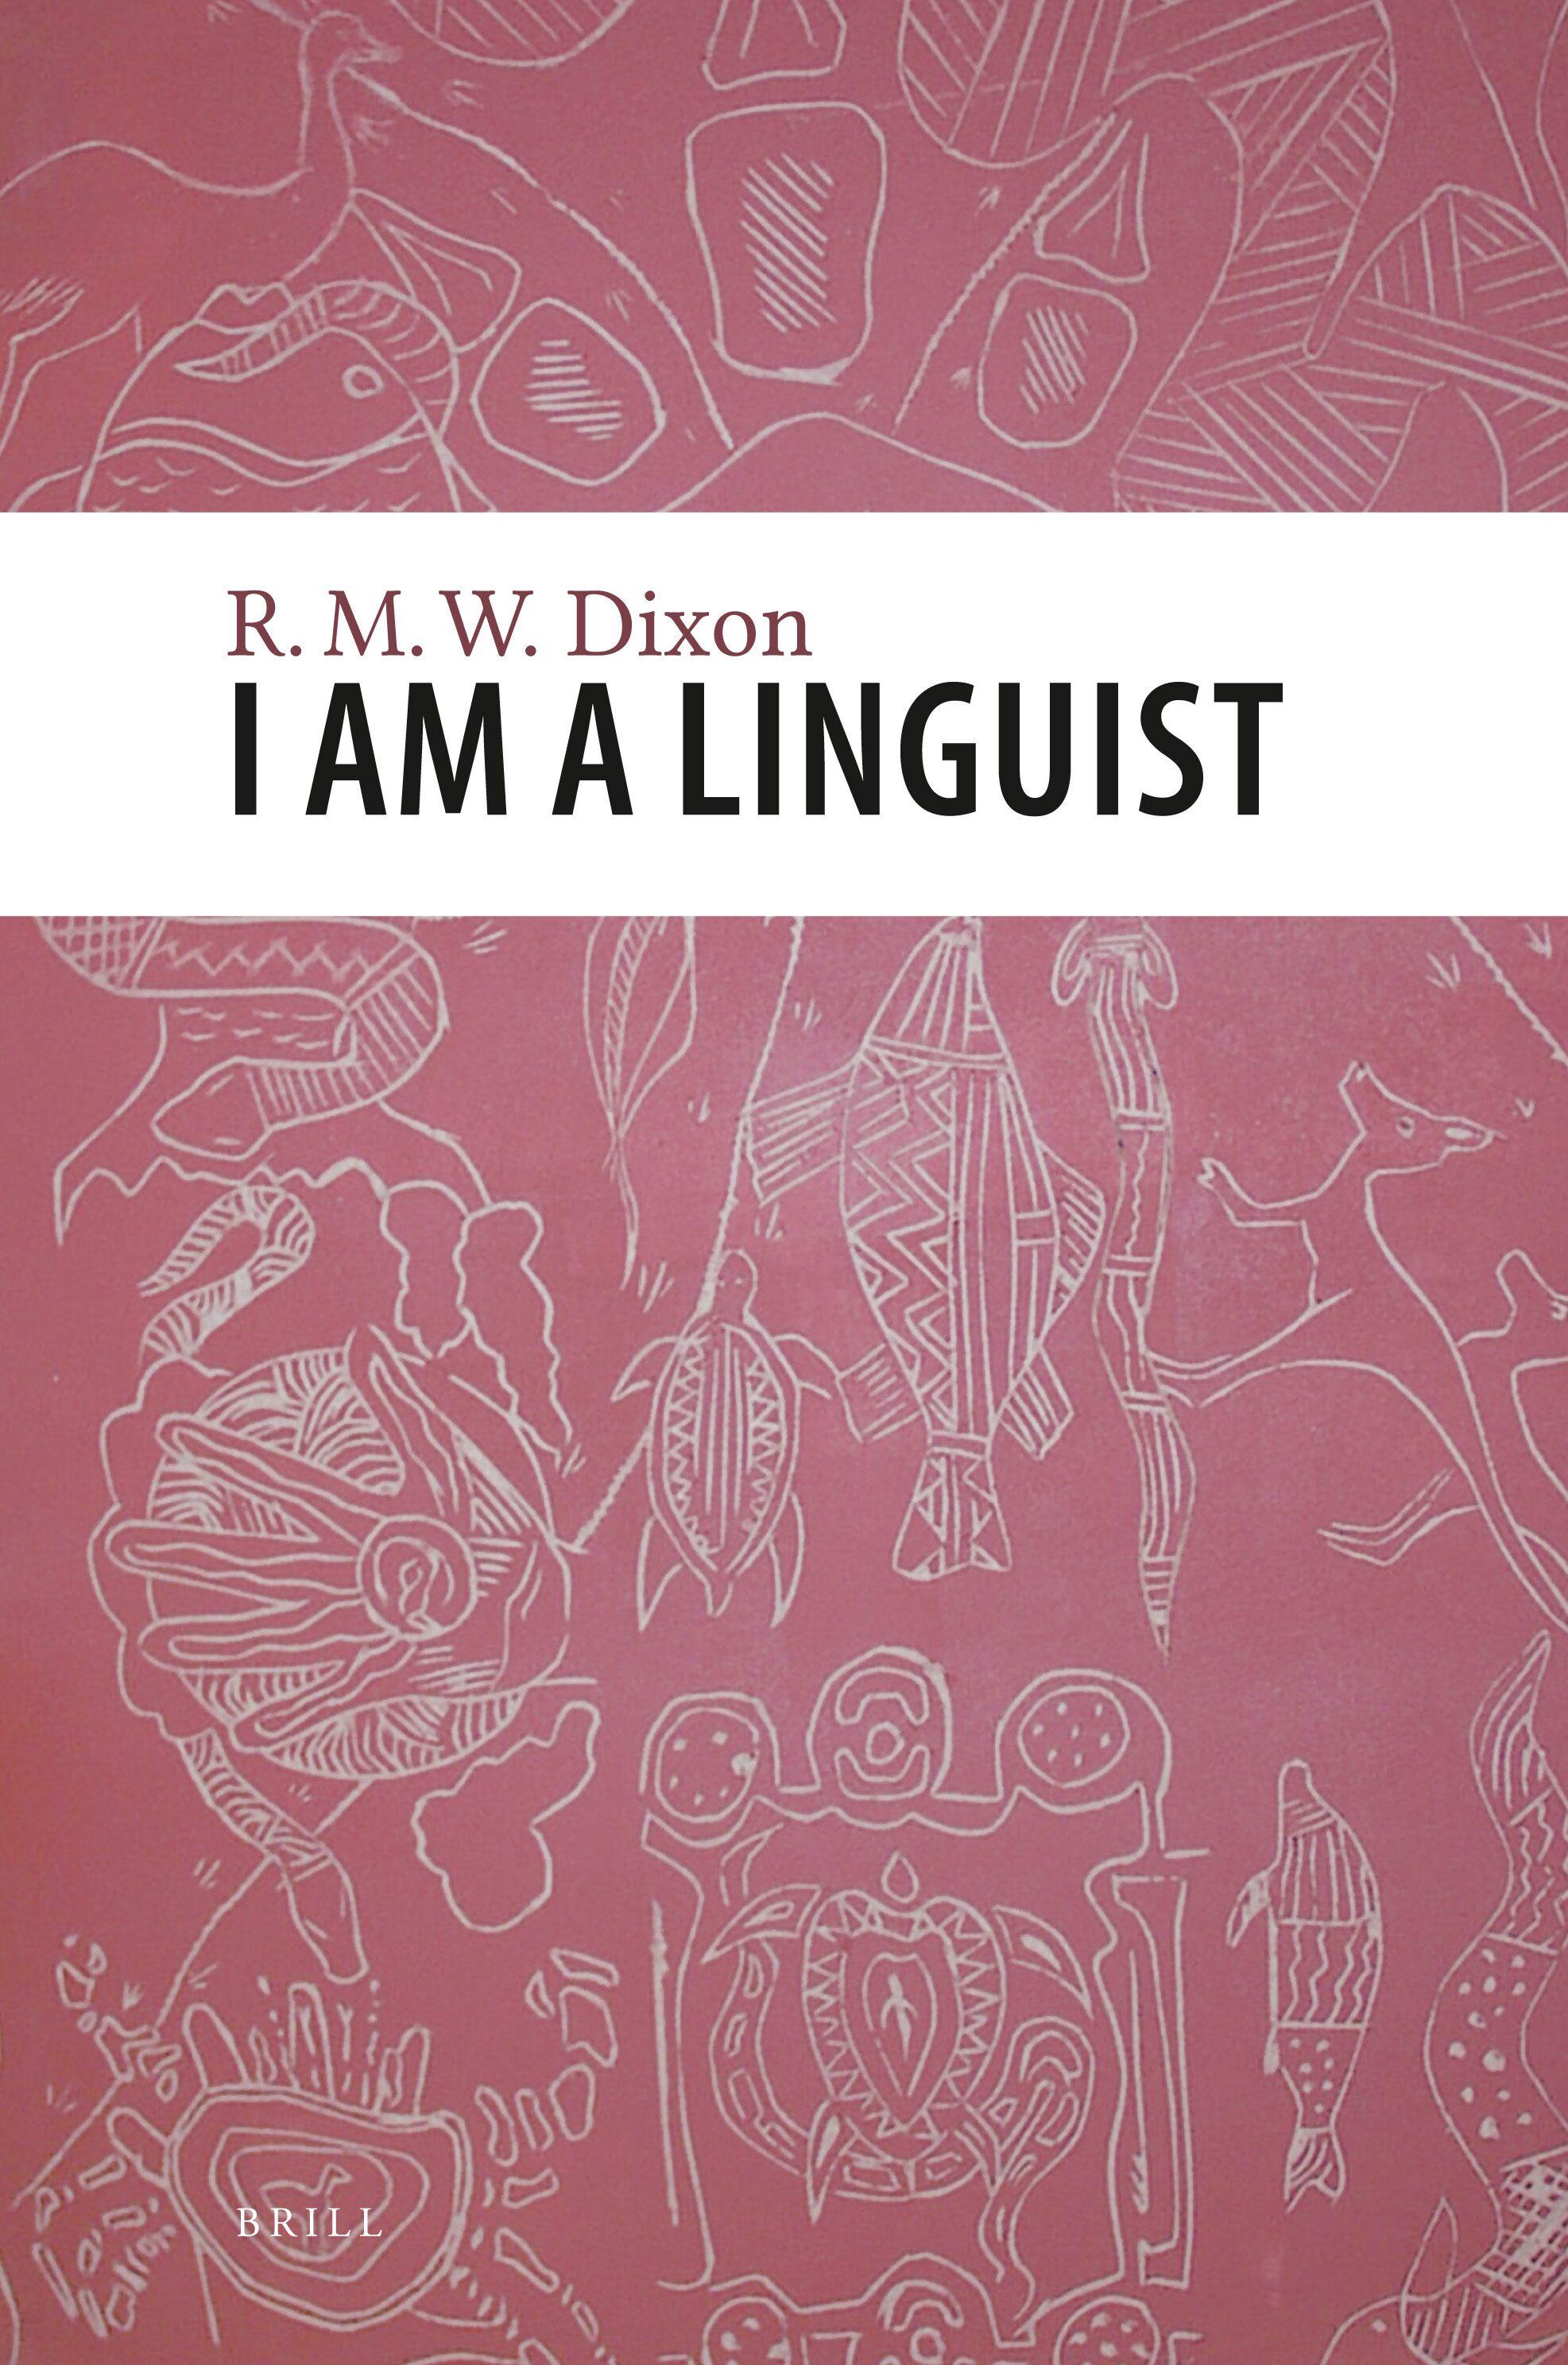 I am a Linguist